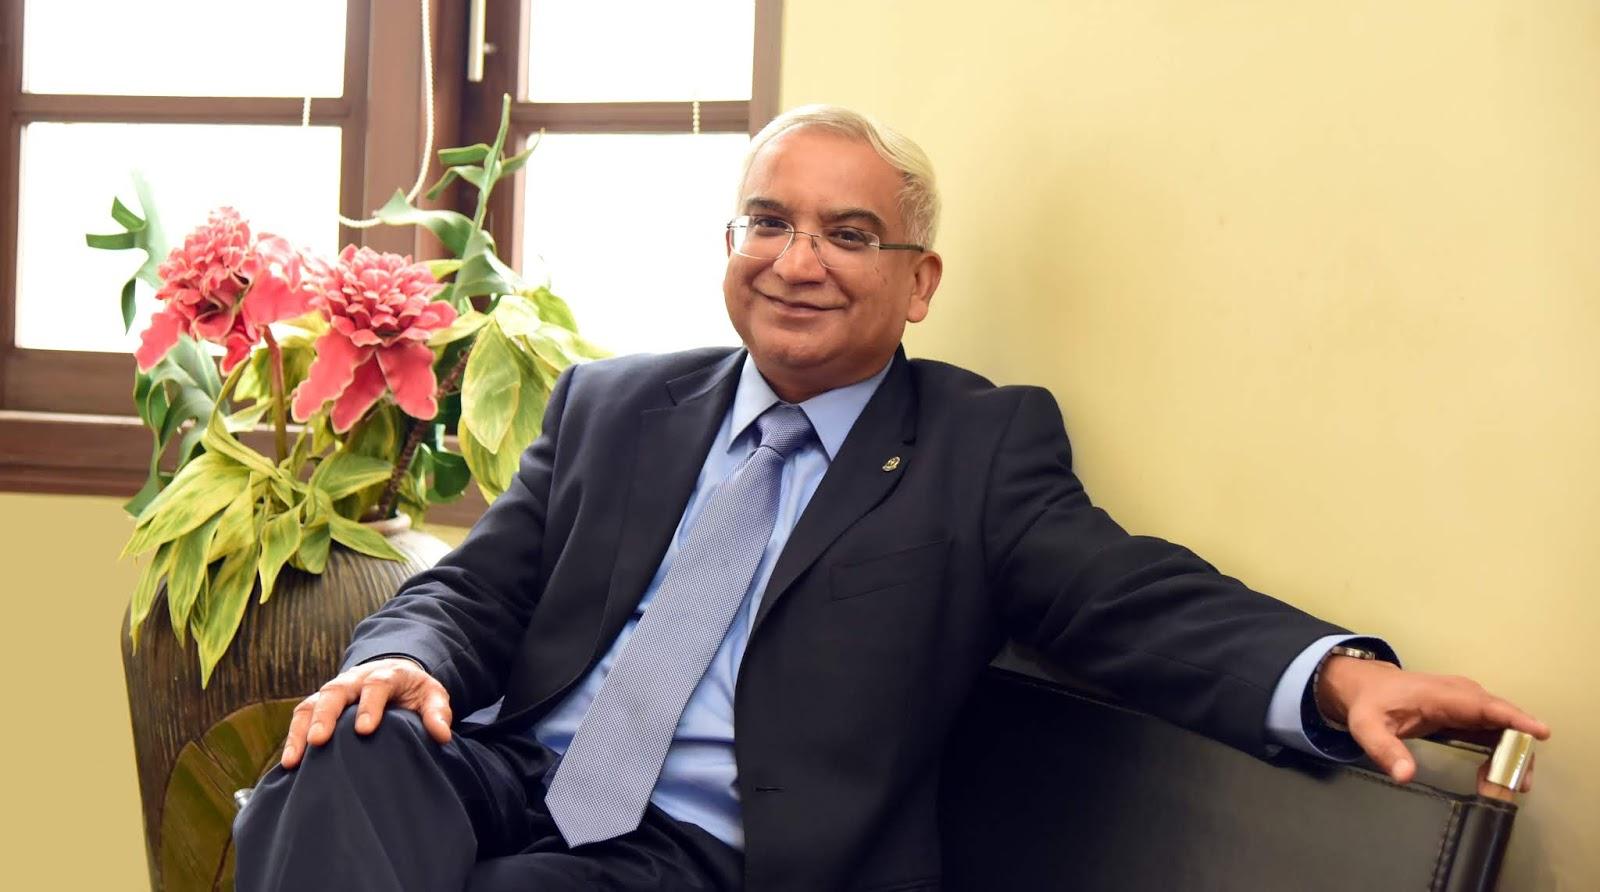 IMC President Ashish Vaid's view on RBI's Third Monetary Policy